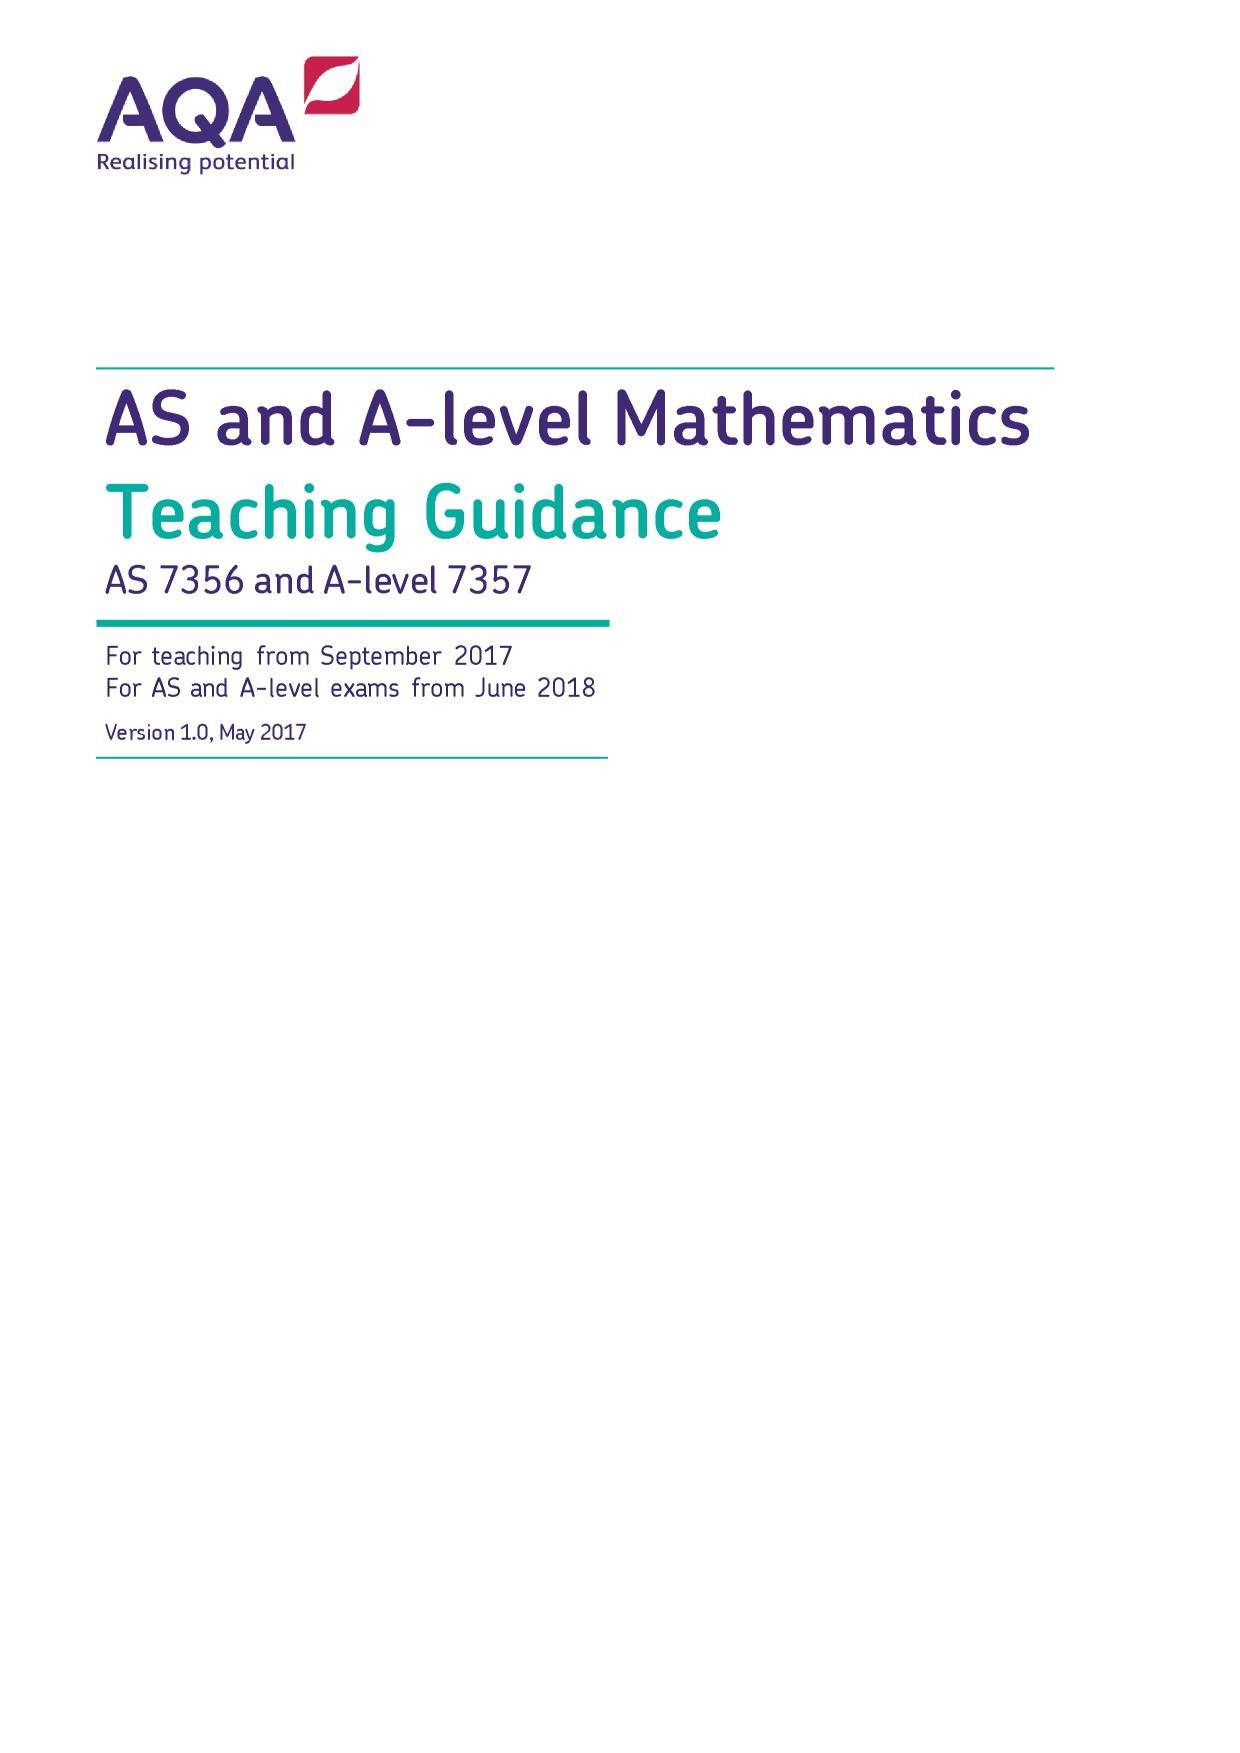 AQA AS and A-Level mathematics teaching guidance